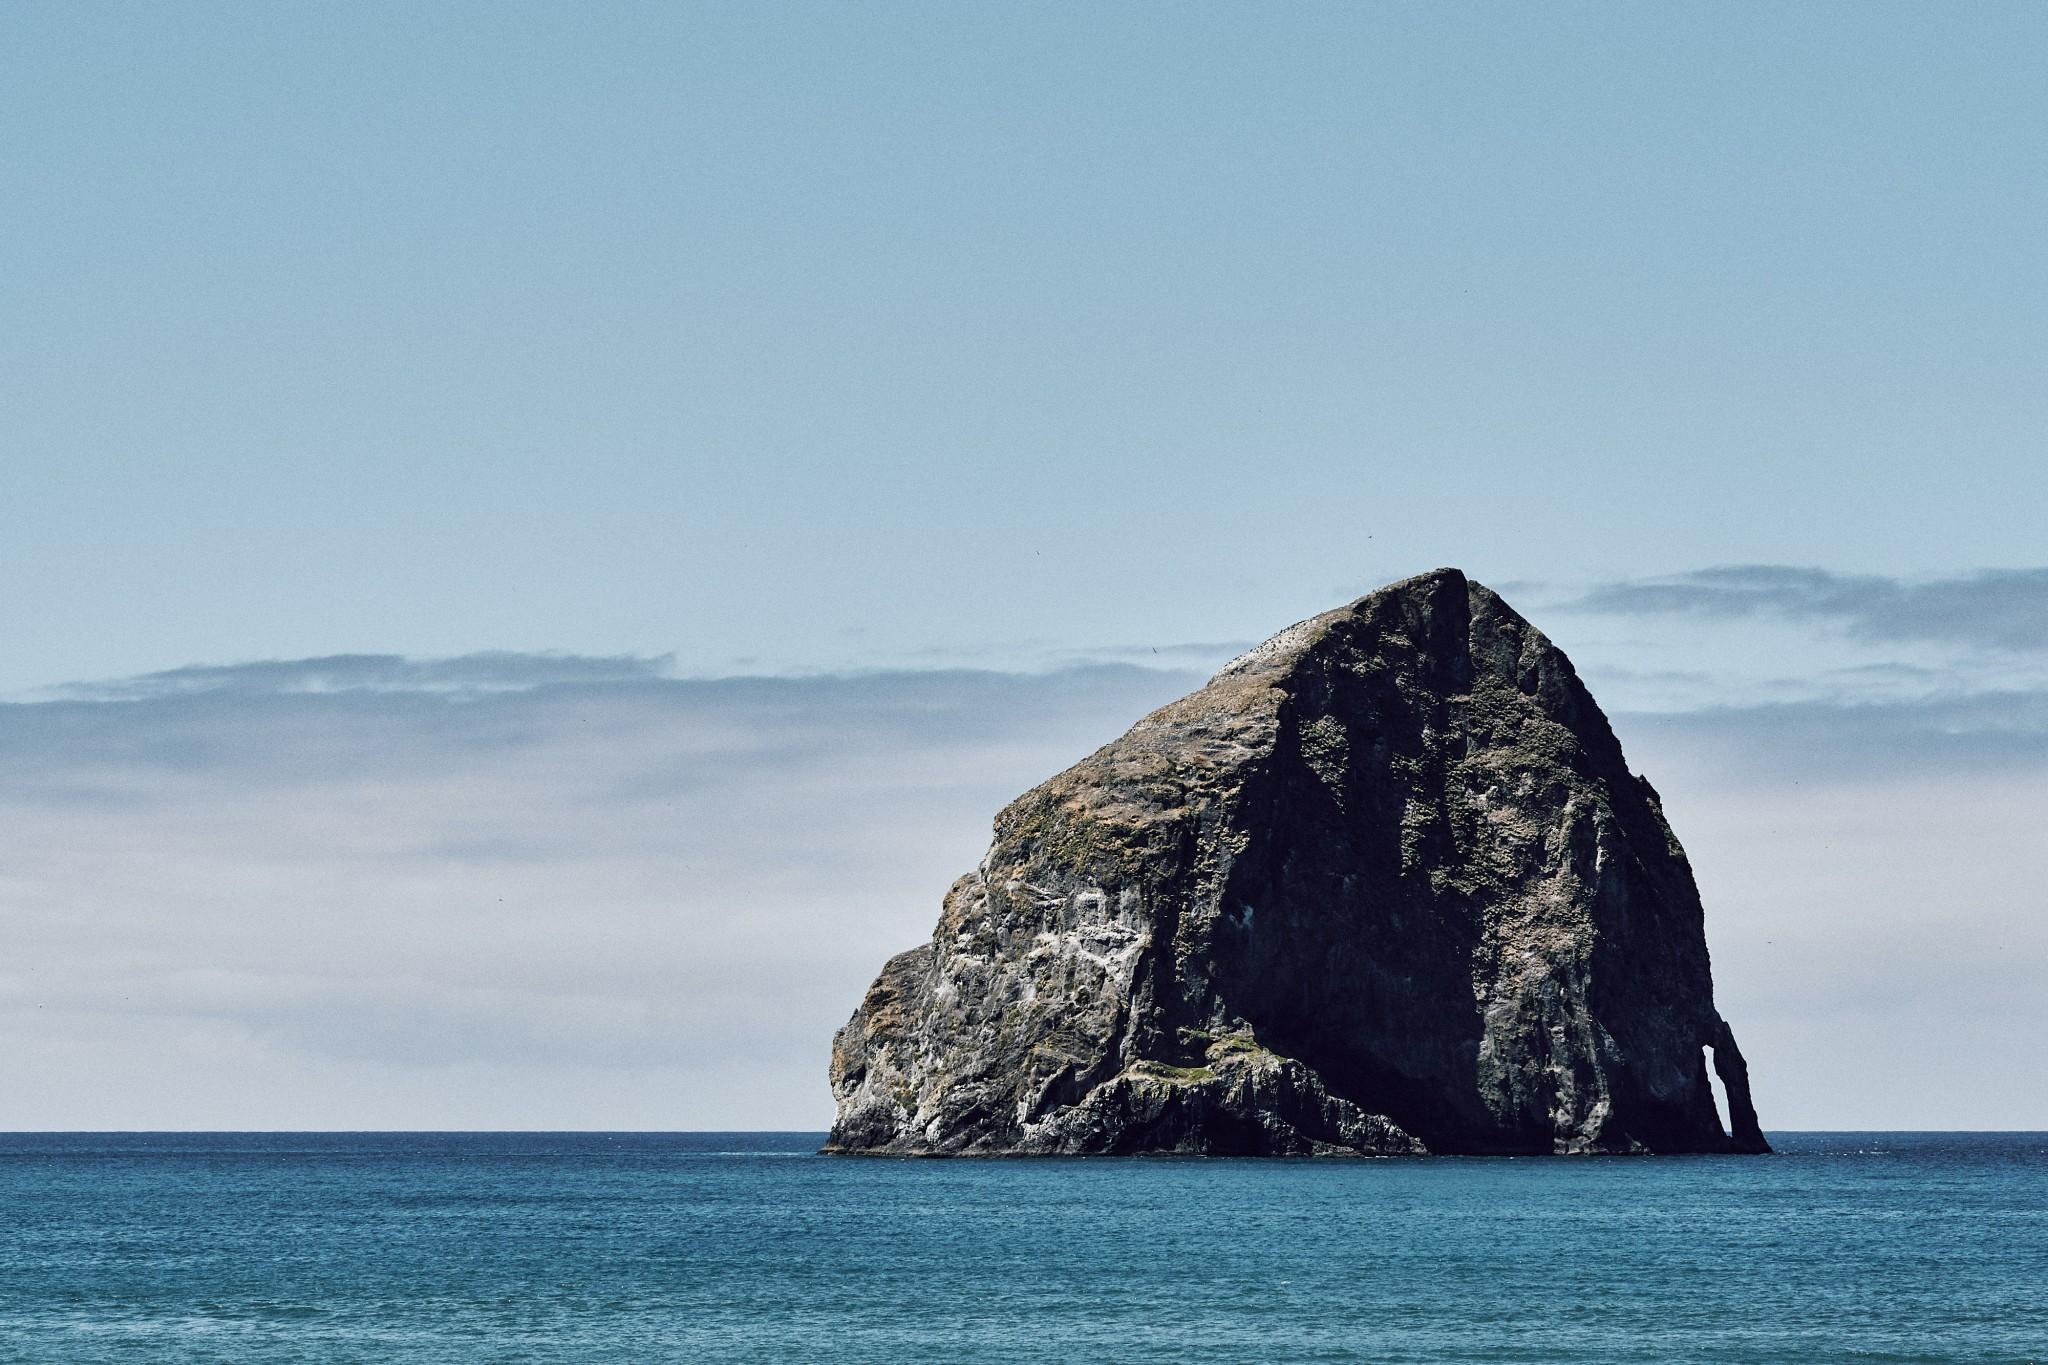 01-Chief-Kiawanda-Rock.jpg